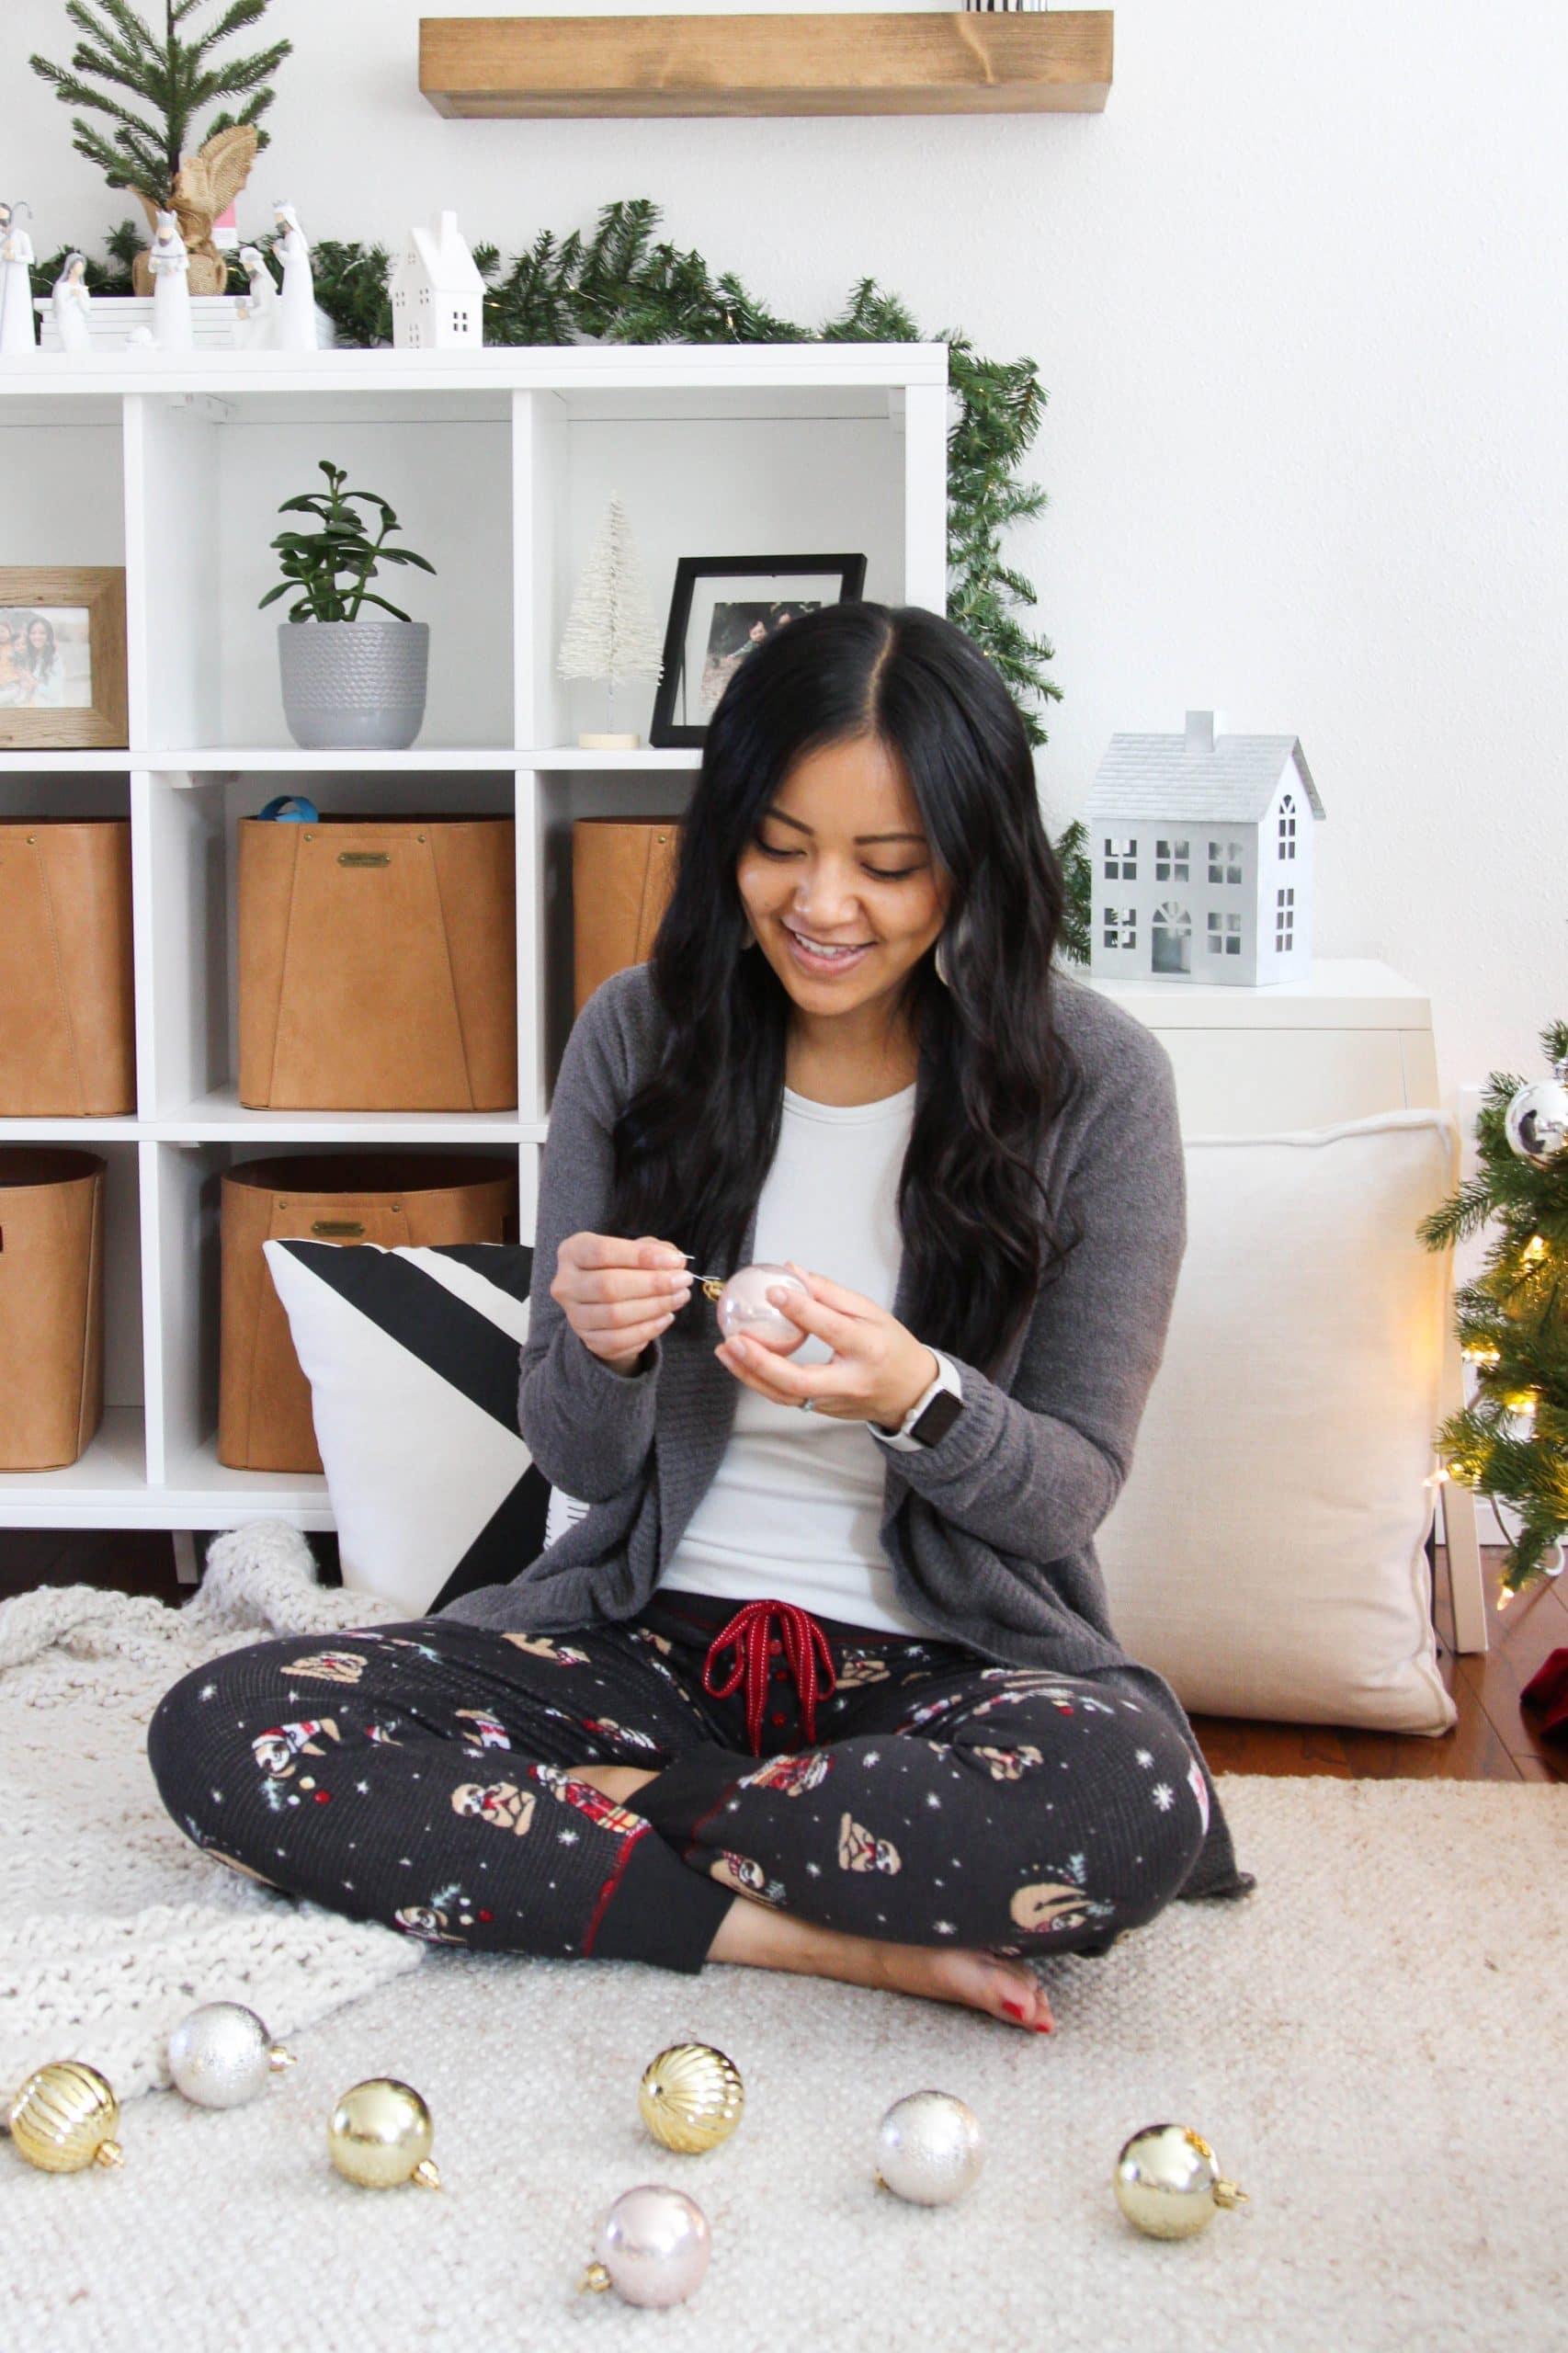 printed thermal fleece pants + white top + grey Barefoot Dreams sweater + cute loungewear